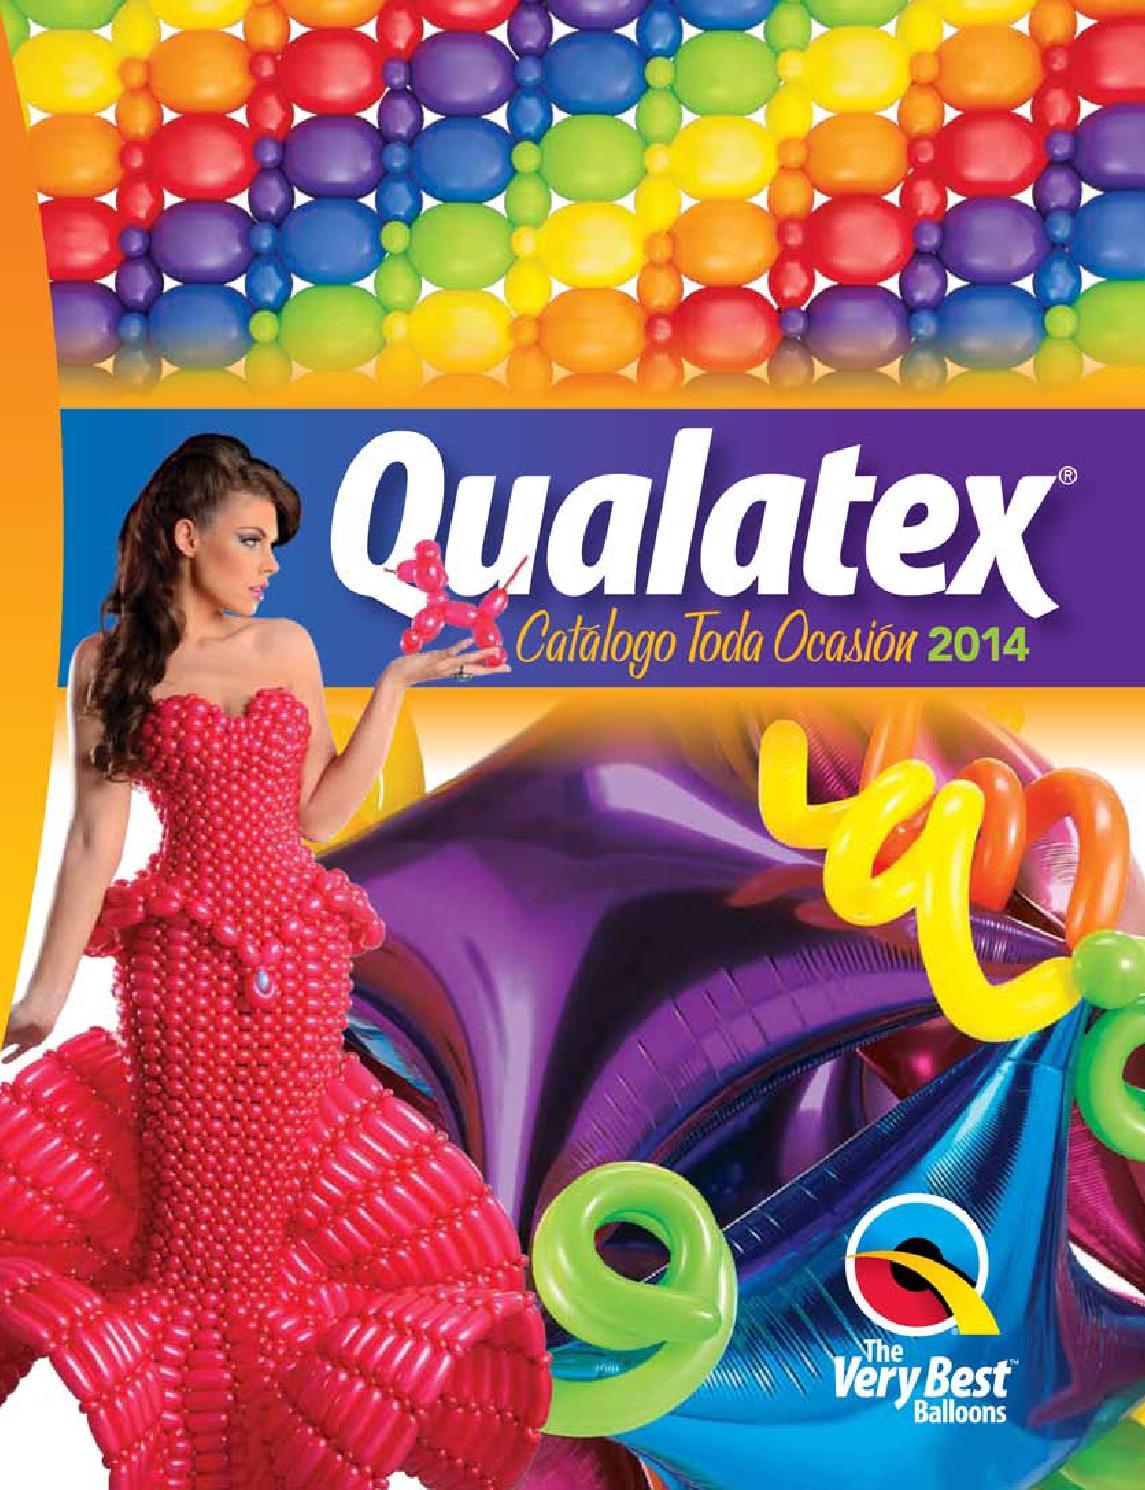 Cara divertida flor 32 Pulgadas Globo Papel Aluminio Qualatex